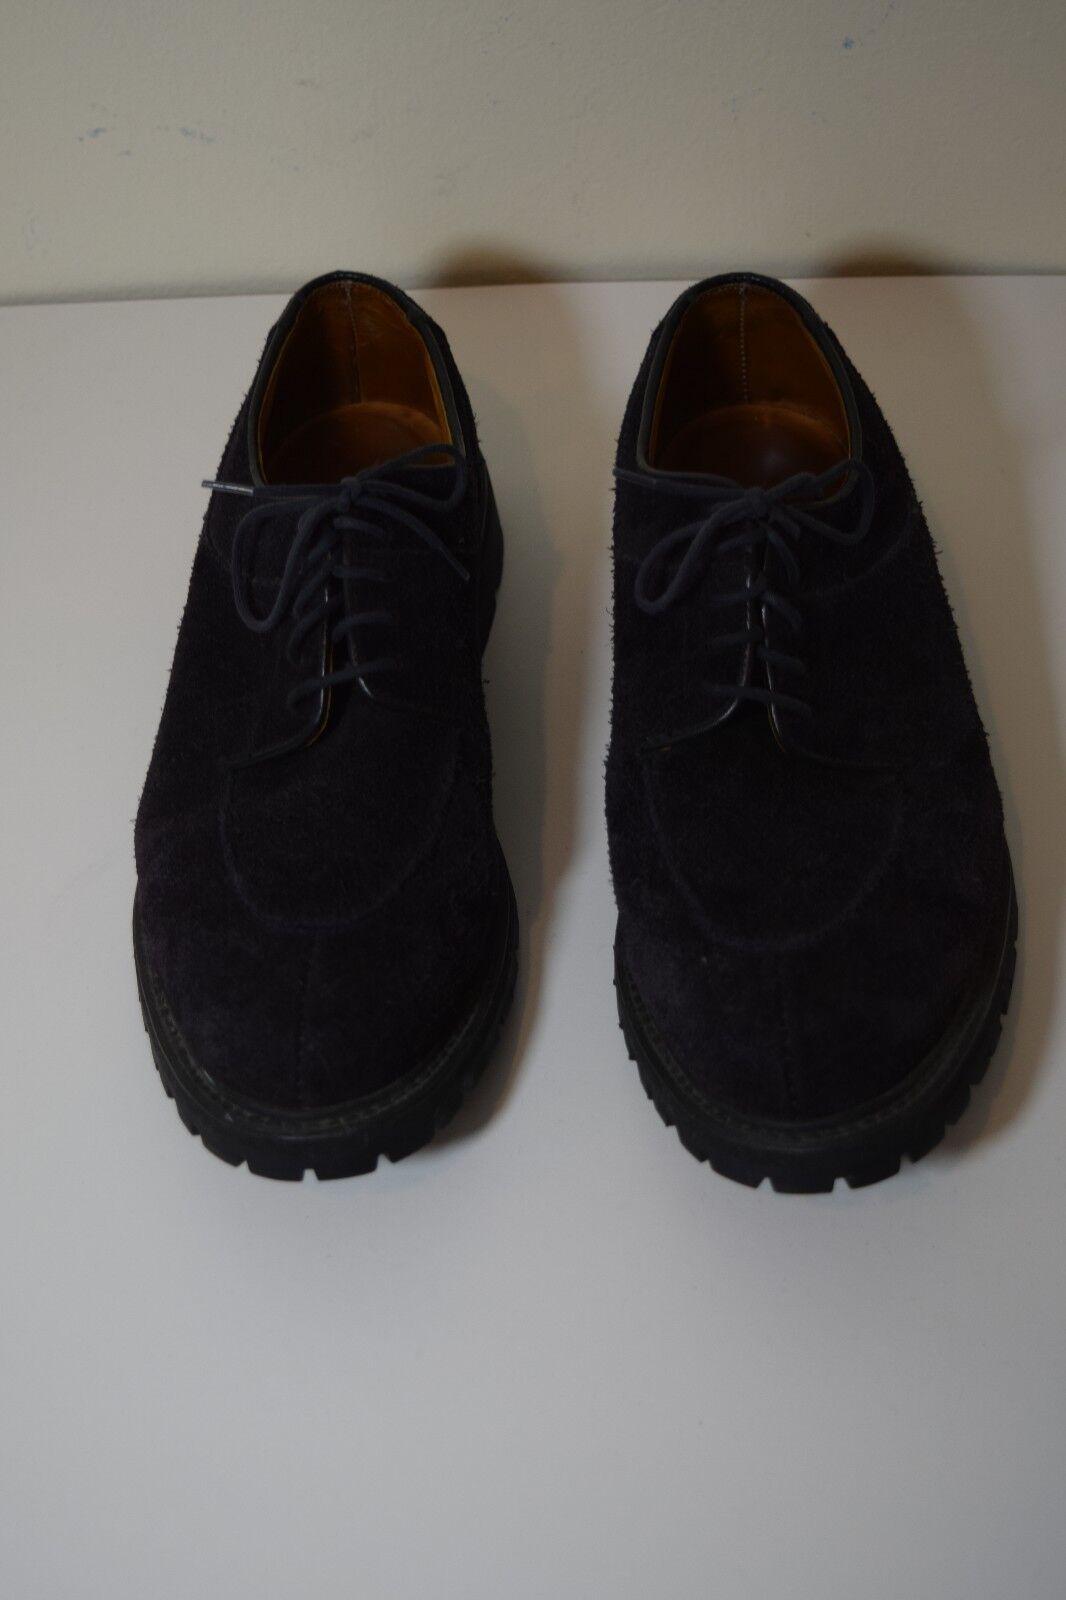 Alfred Sargent Inglaterra para Hombre Zapatos Cuero 7.5 Negro Cuero Zapatos De Gamuza aeed2e